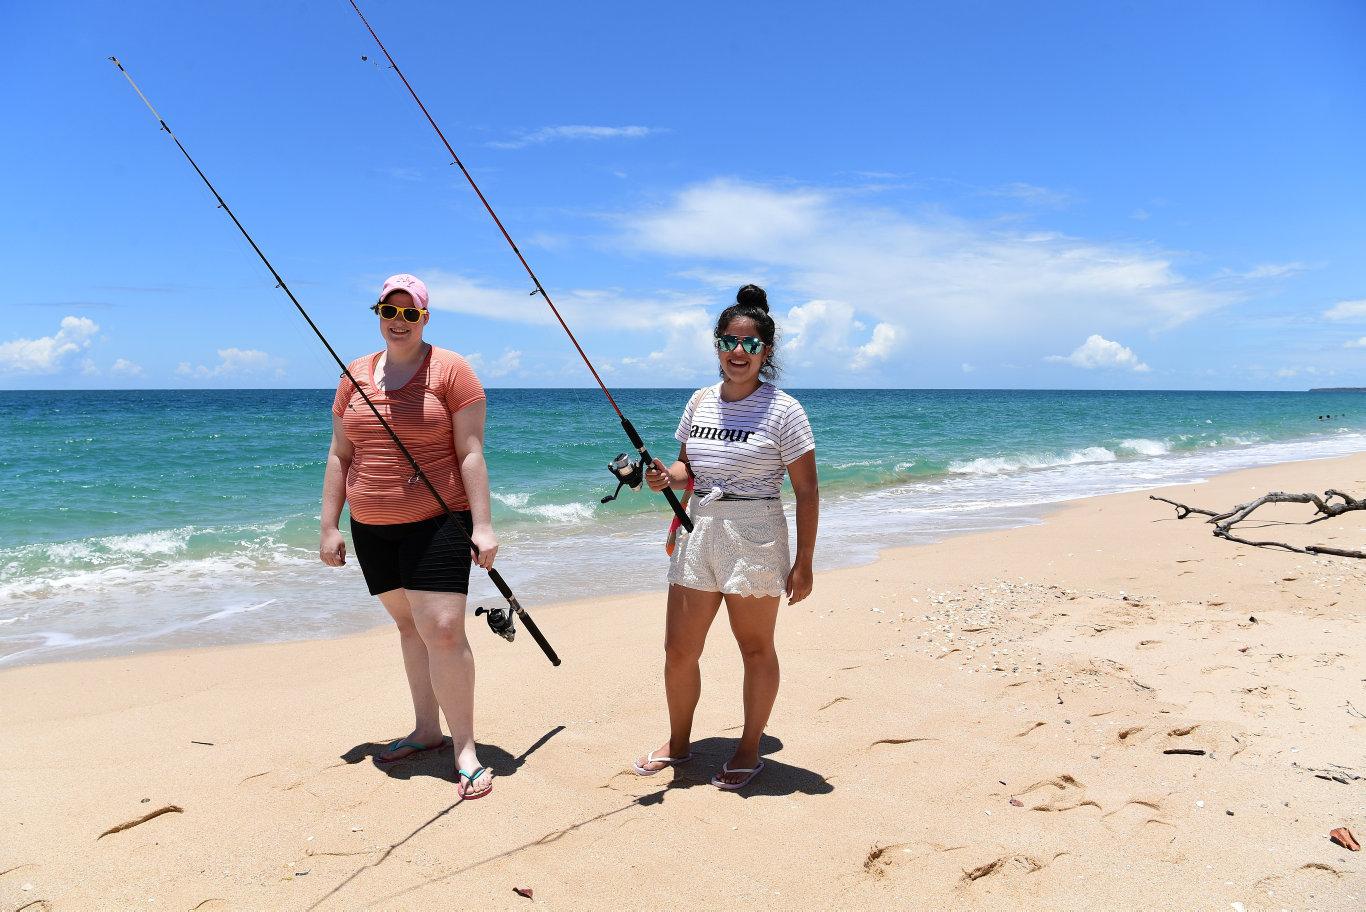 Sarah Johnson and Beth Falzon at Woodgate Beach.